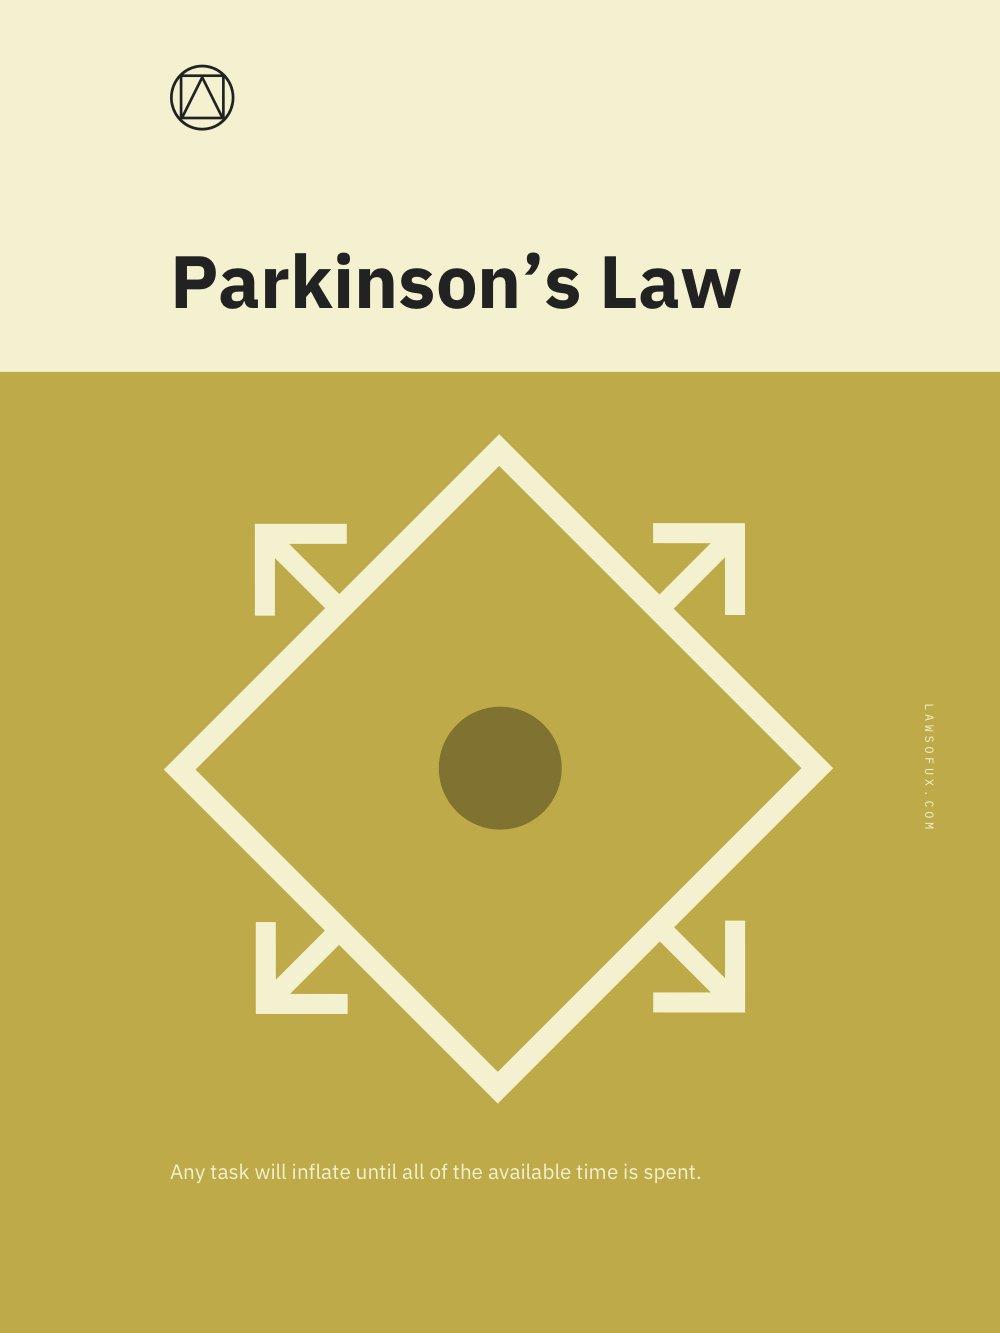 Parkinson's Law Poster